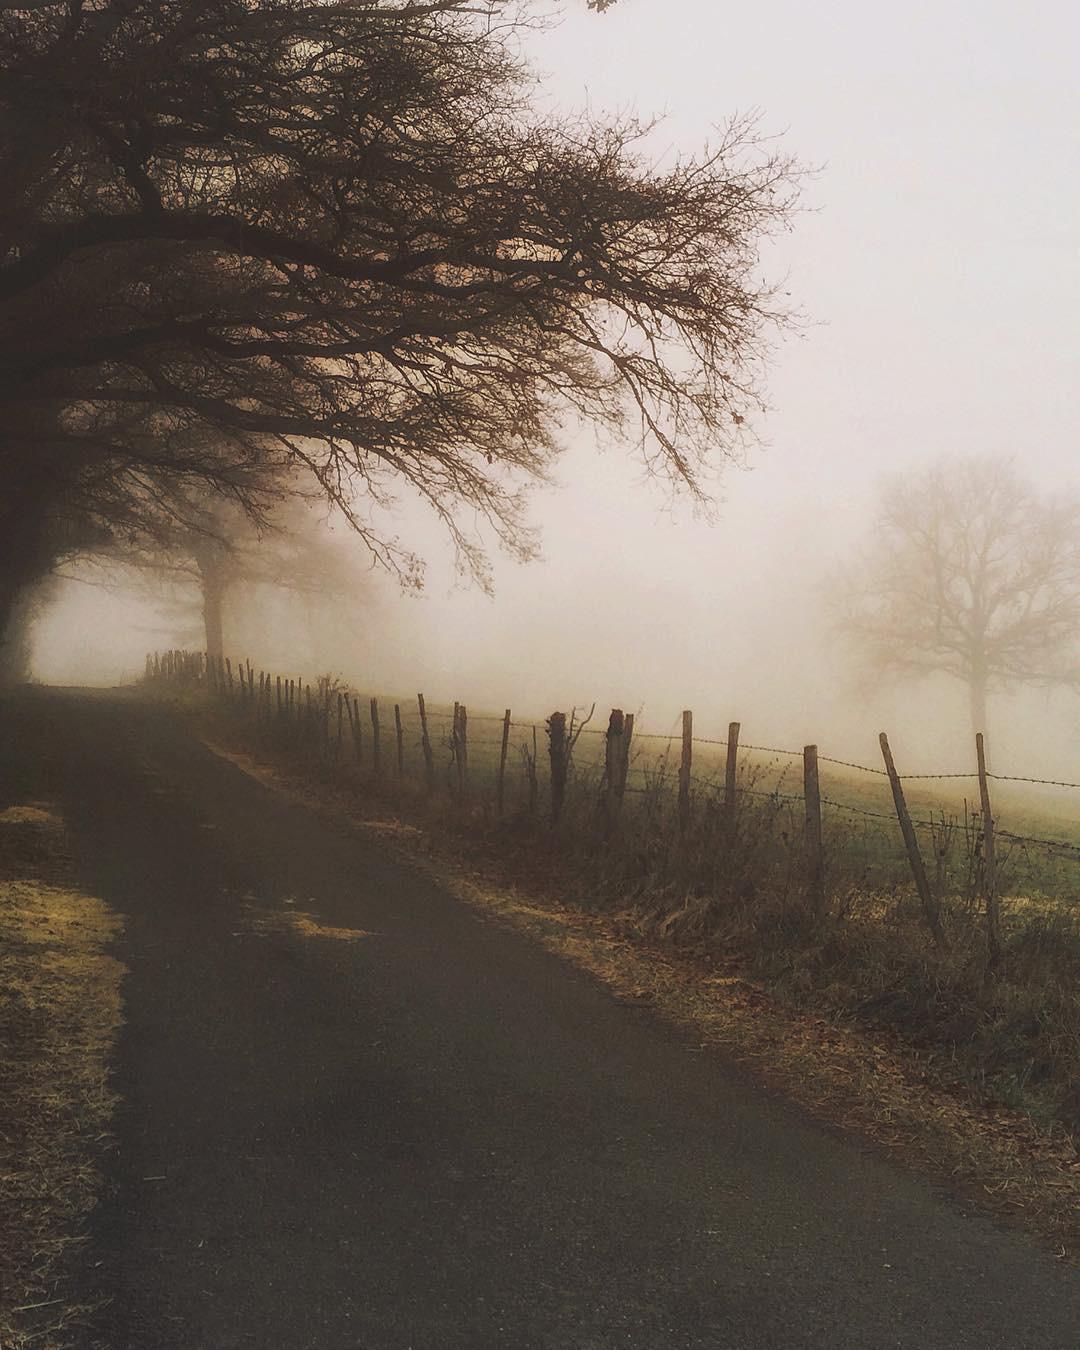 soulfulwanderings - TLRMJCT.jpeg